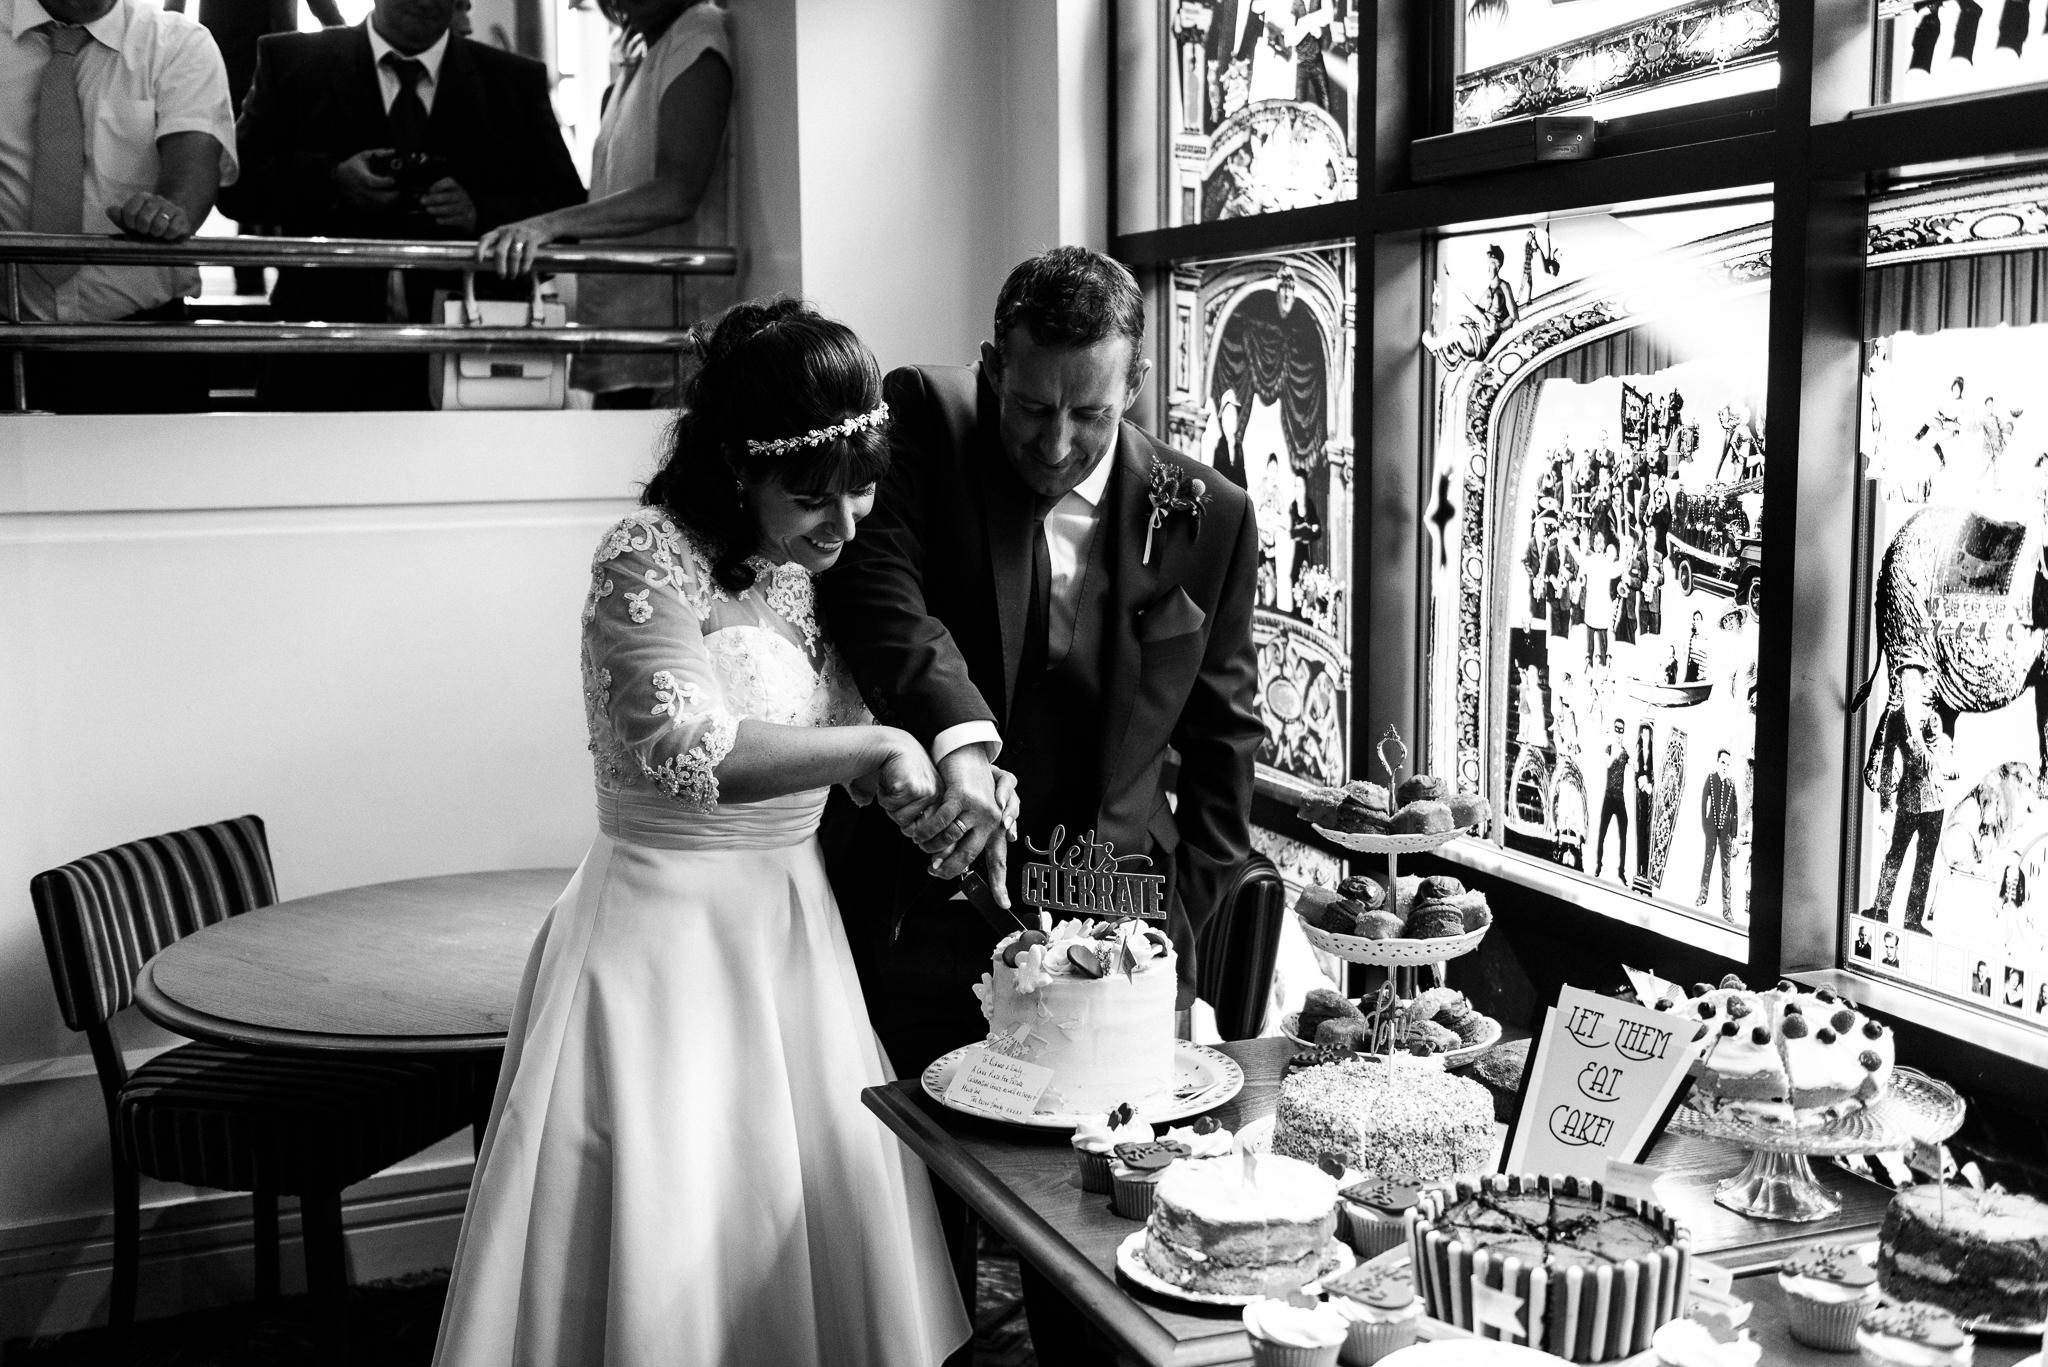 Cheshire Wedding Photography at Crewe Lyceum Theatre Stage Wedding Art Deco 20s - Jenny Harper-63.jpg